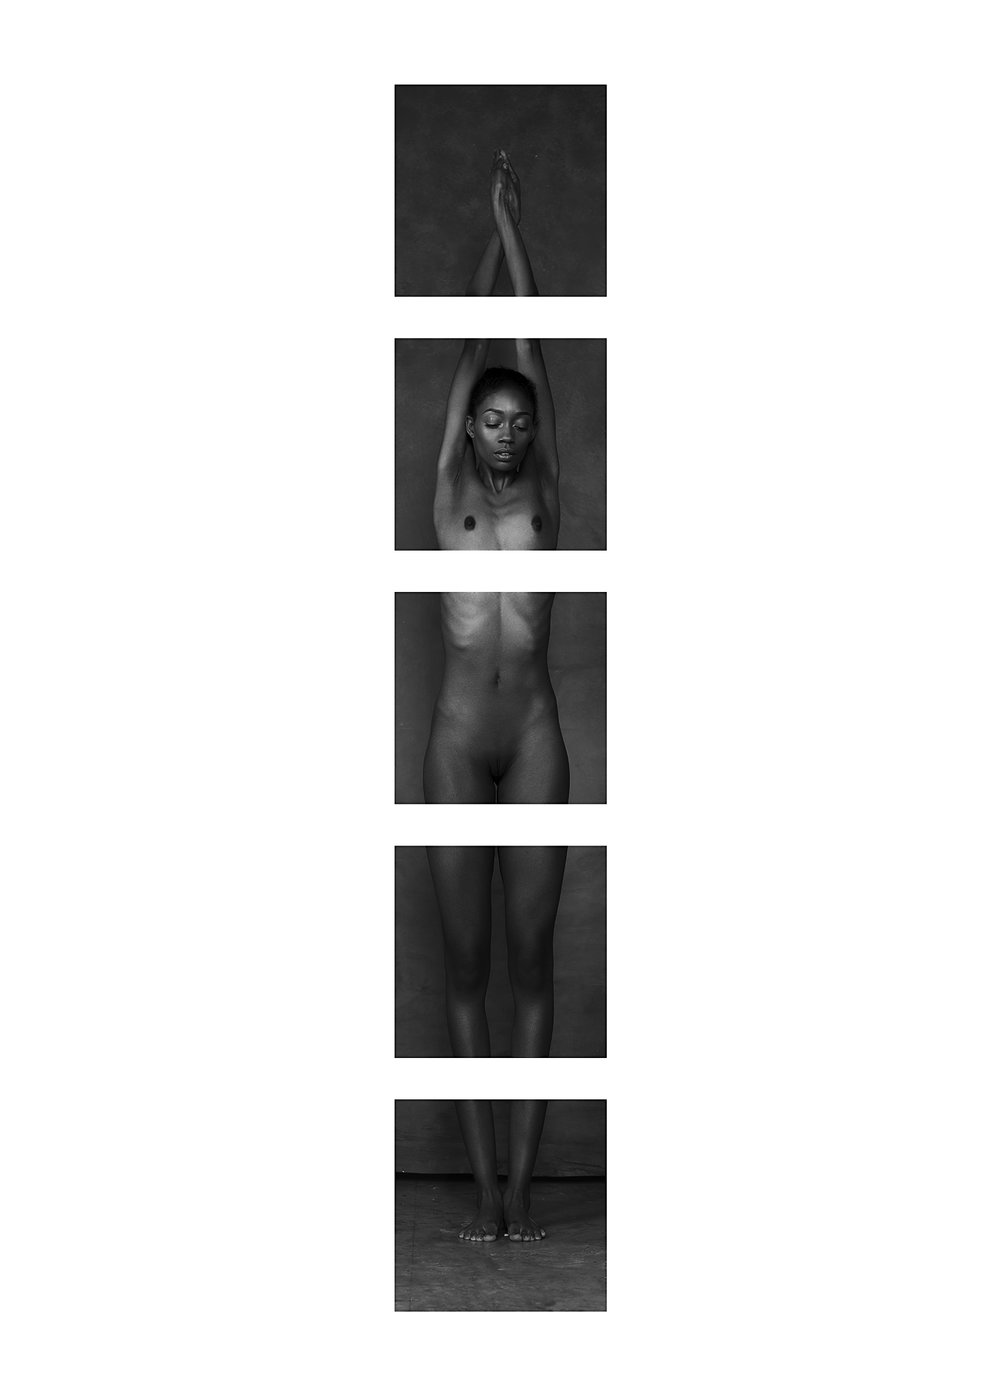 alexis 2 5x7.jpg